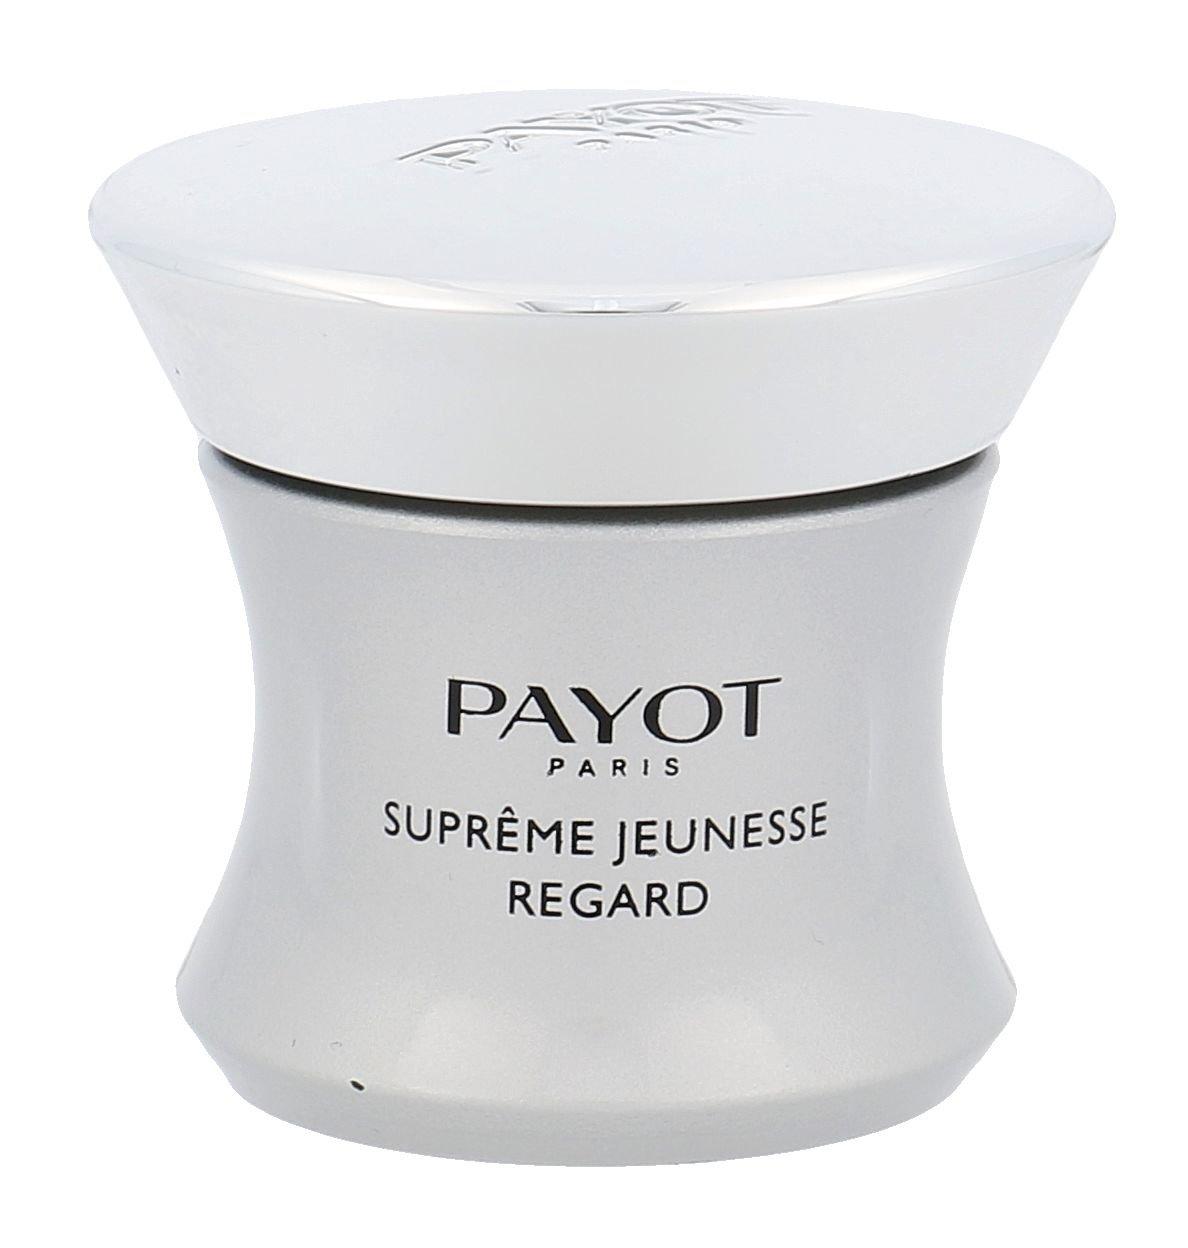 PAYOT Supreme Jeunesse Cosmetic 15ml  Regard